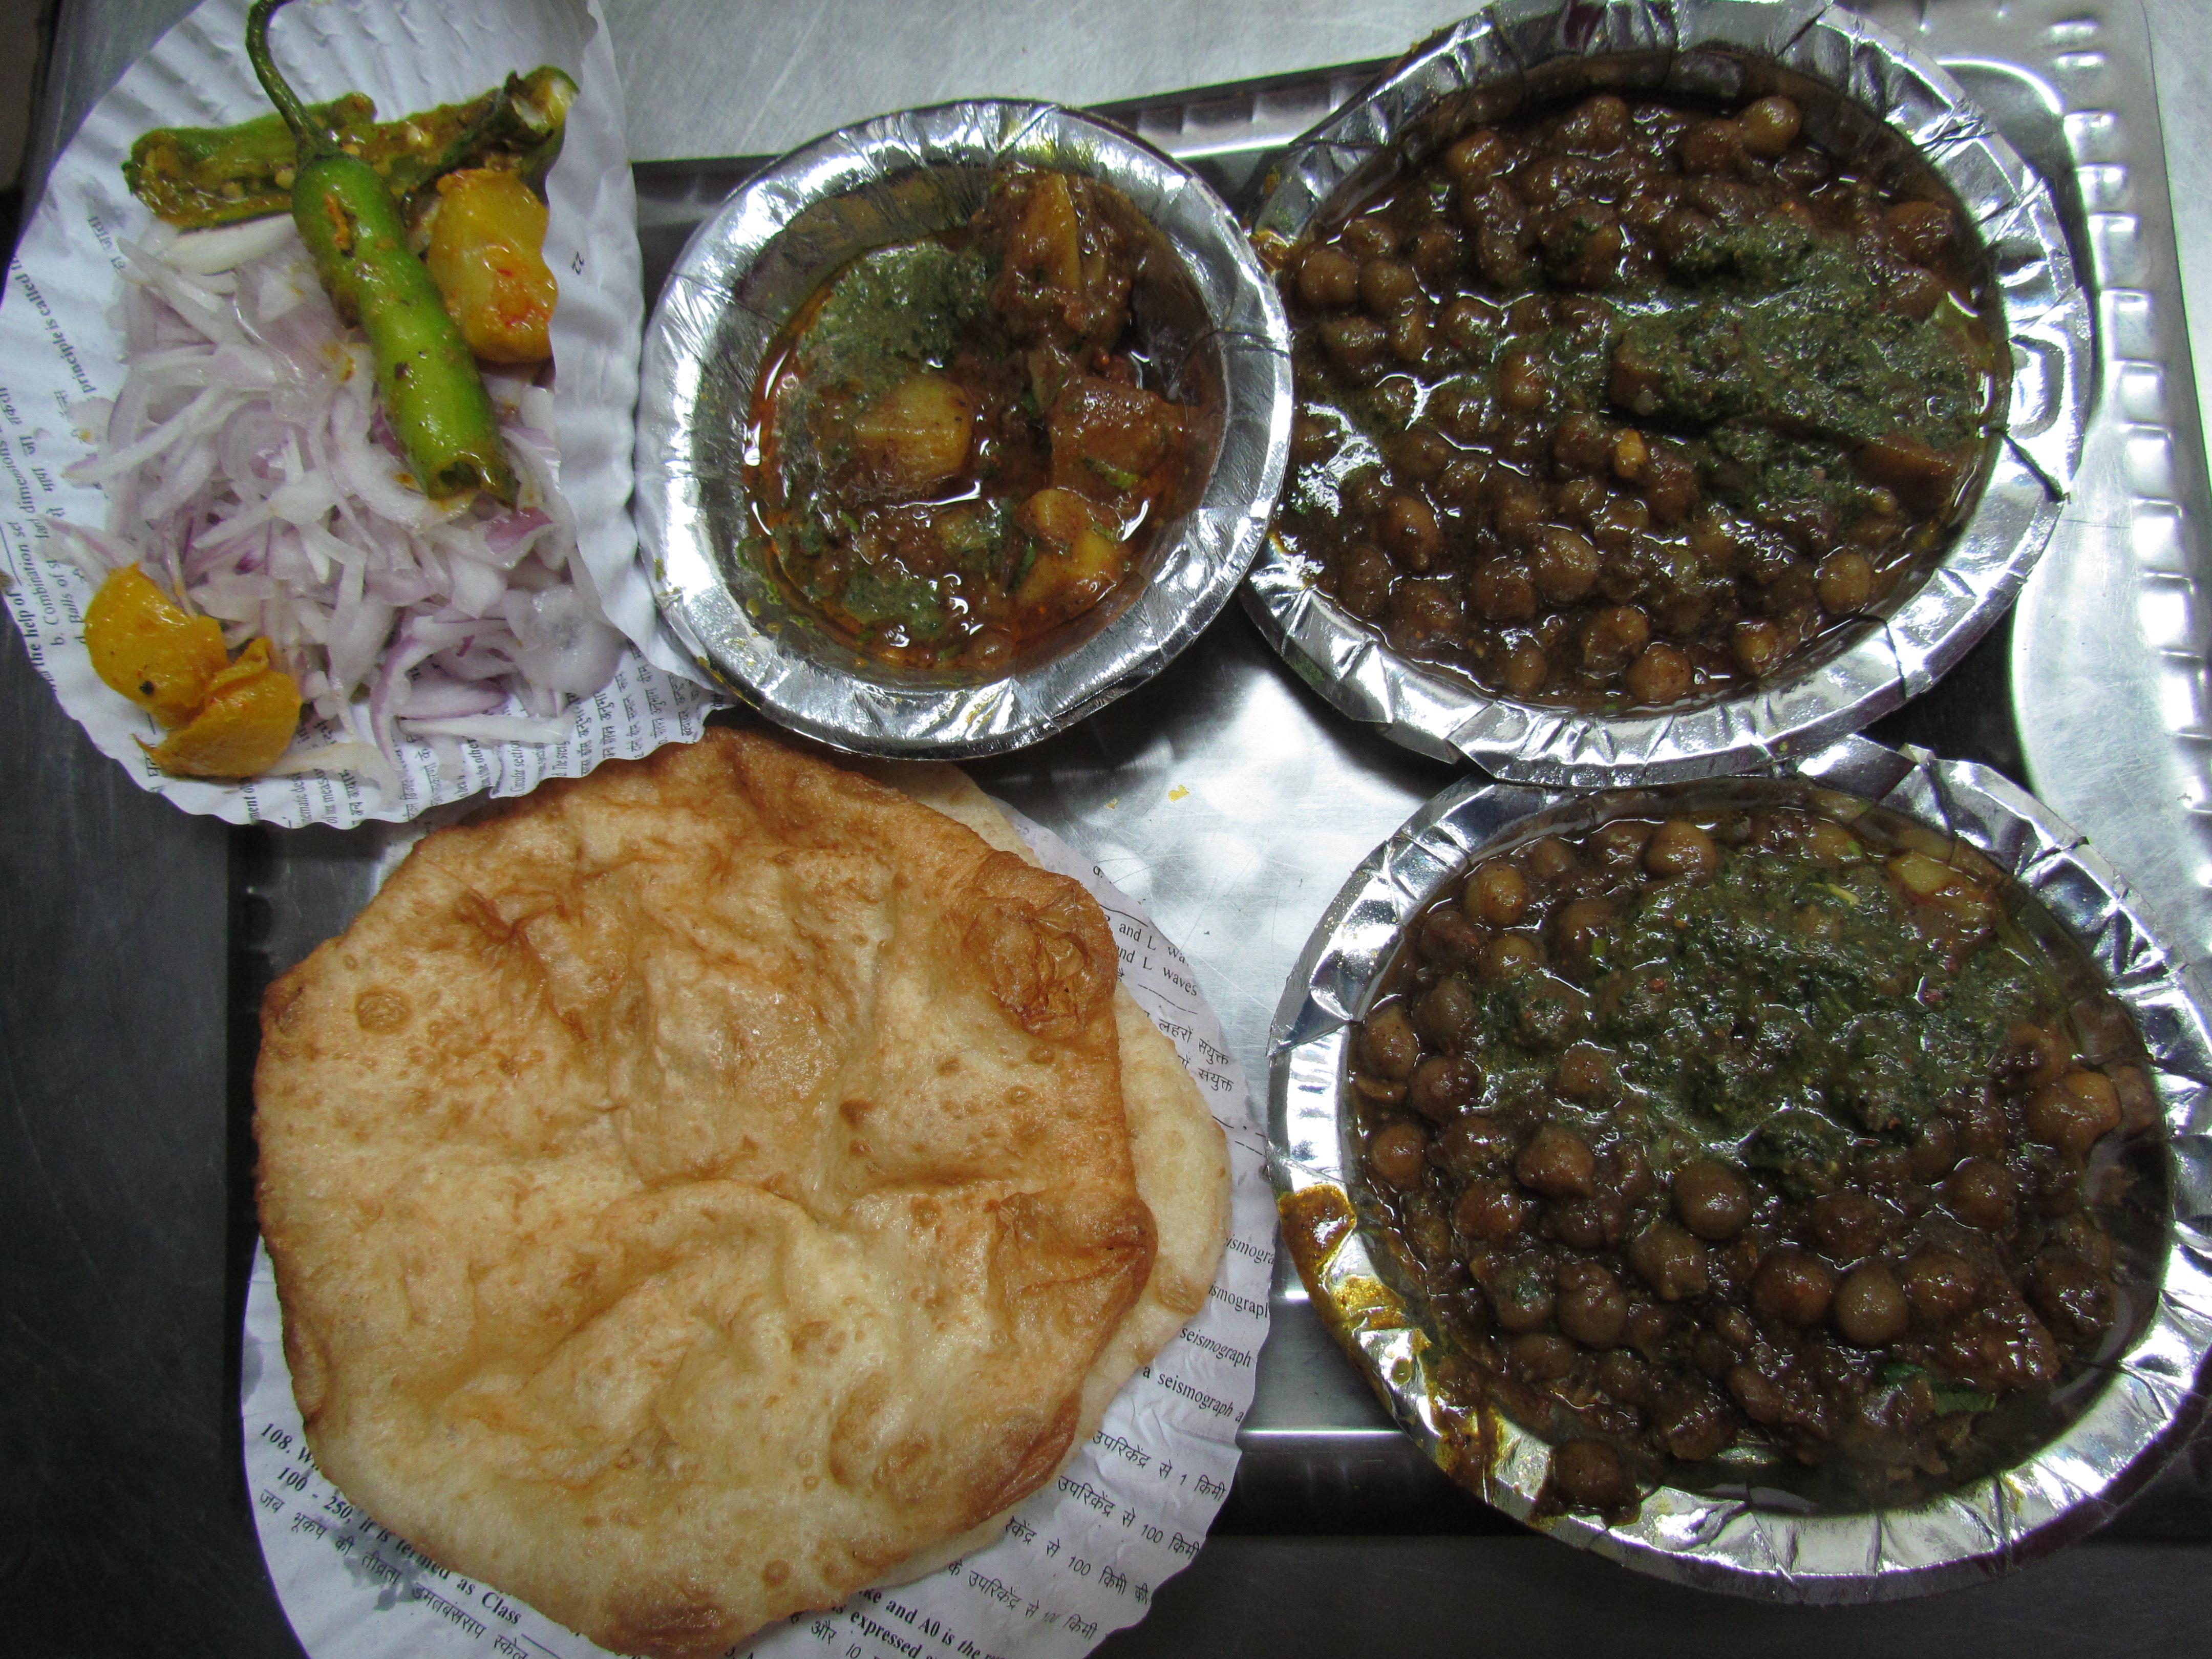 Food Near Th Street Station